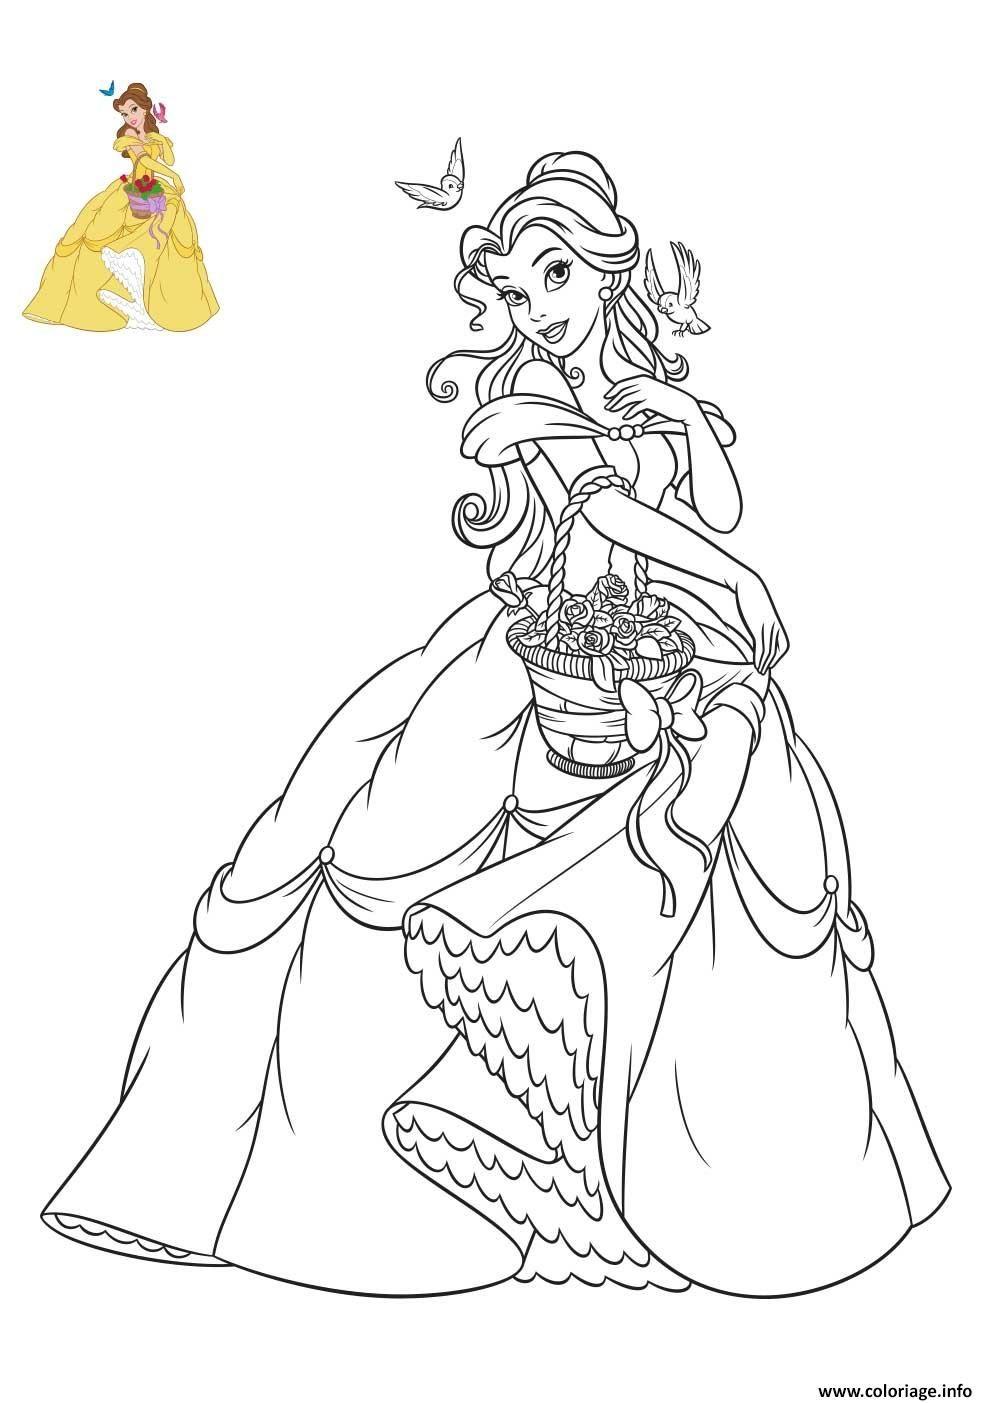 Coloriage Princesse Disney Belle à imprimer  Coloriage princesse